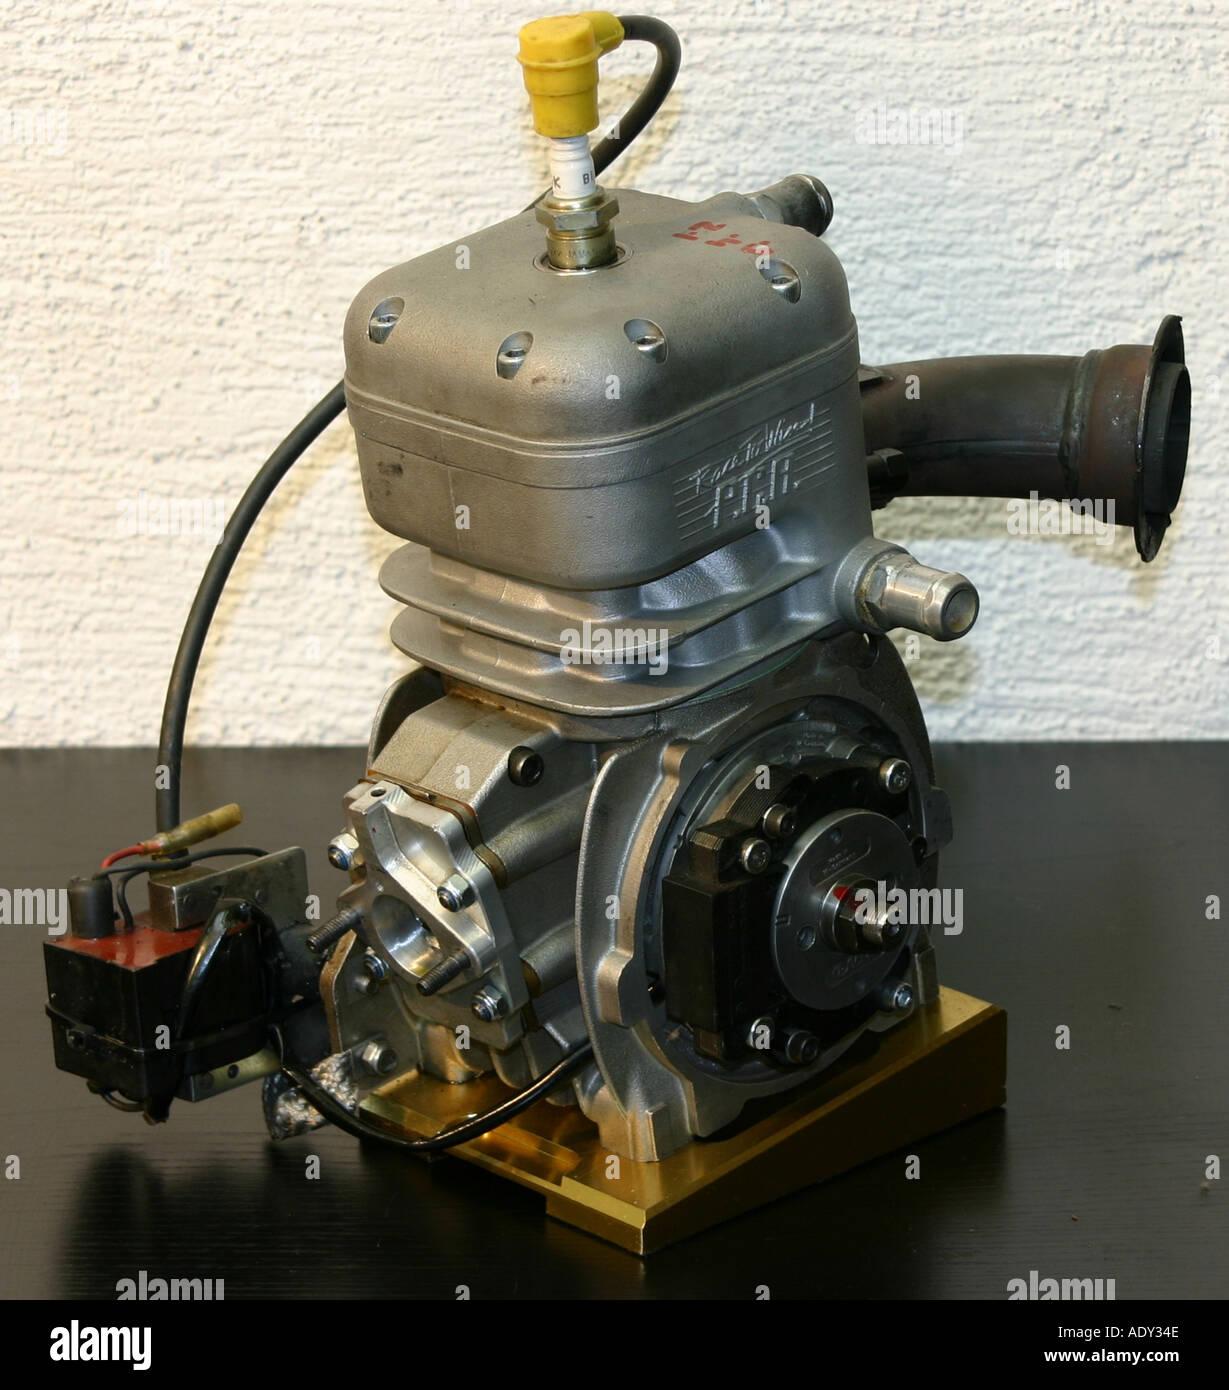 4 Stroke Engine Stock Photos Images Alamy Honda Cb750 Cutaway 100cc Cart Watercooled Image